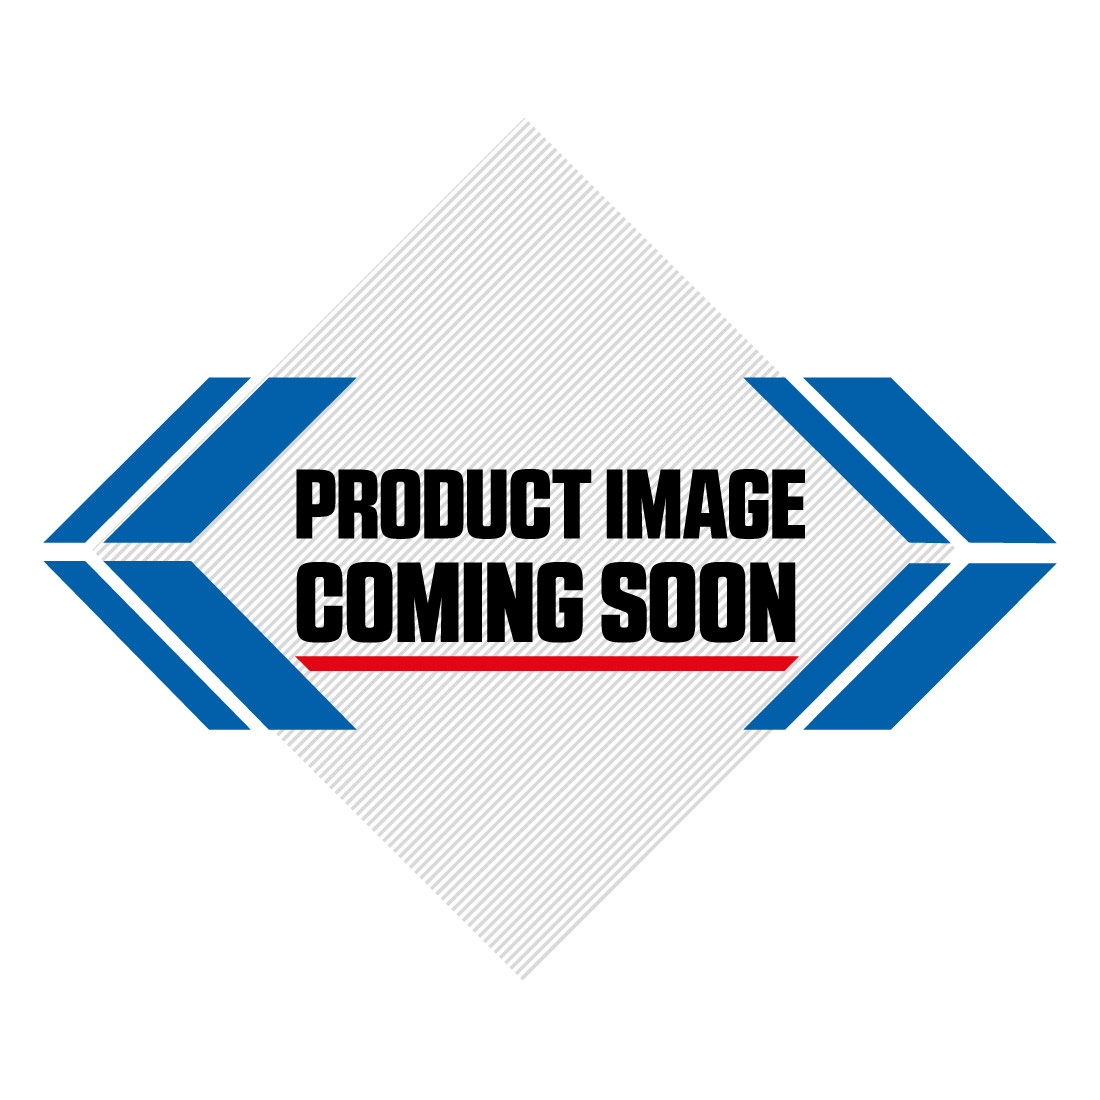 DJI Mavic Pro Fly More Combo 4K Quadcopter Drone Image-3